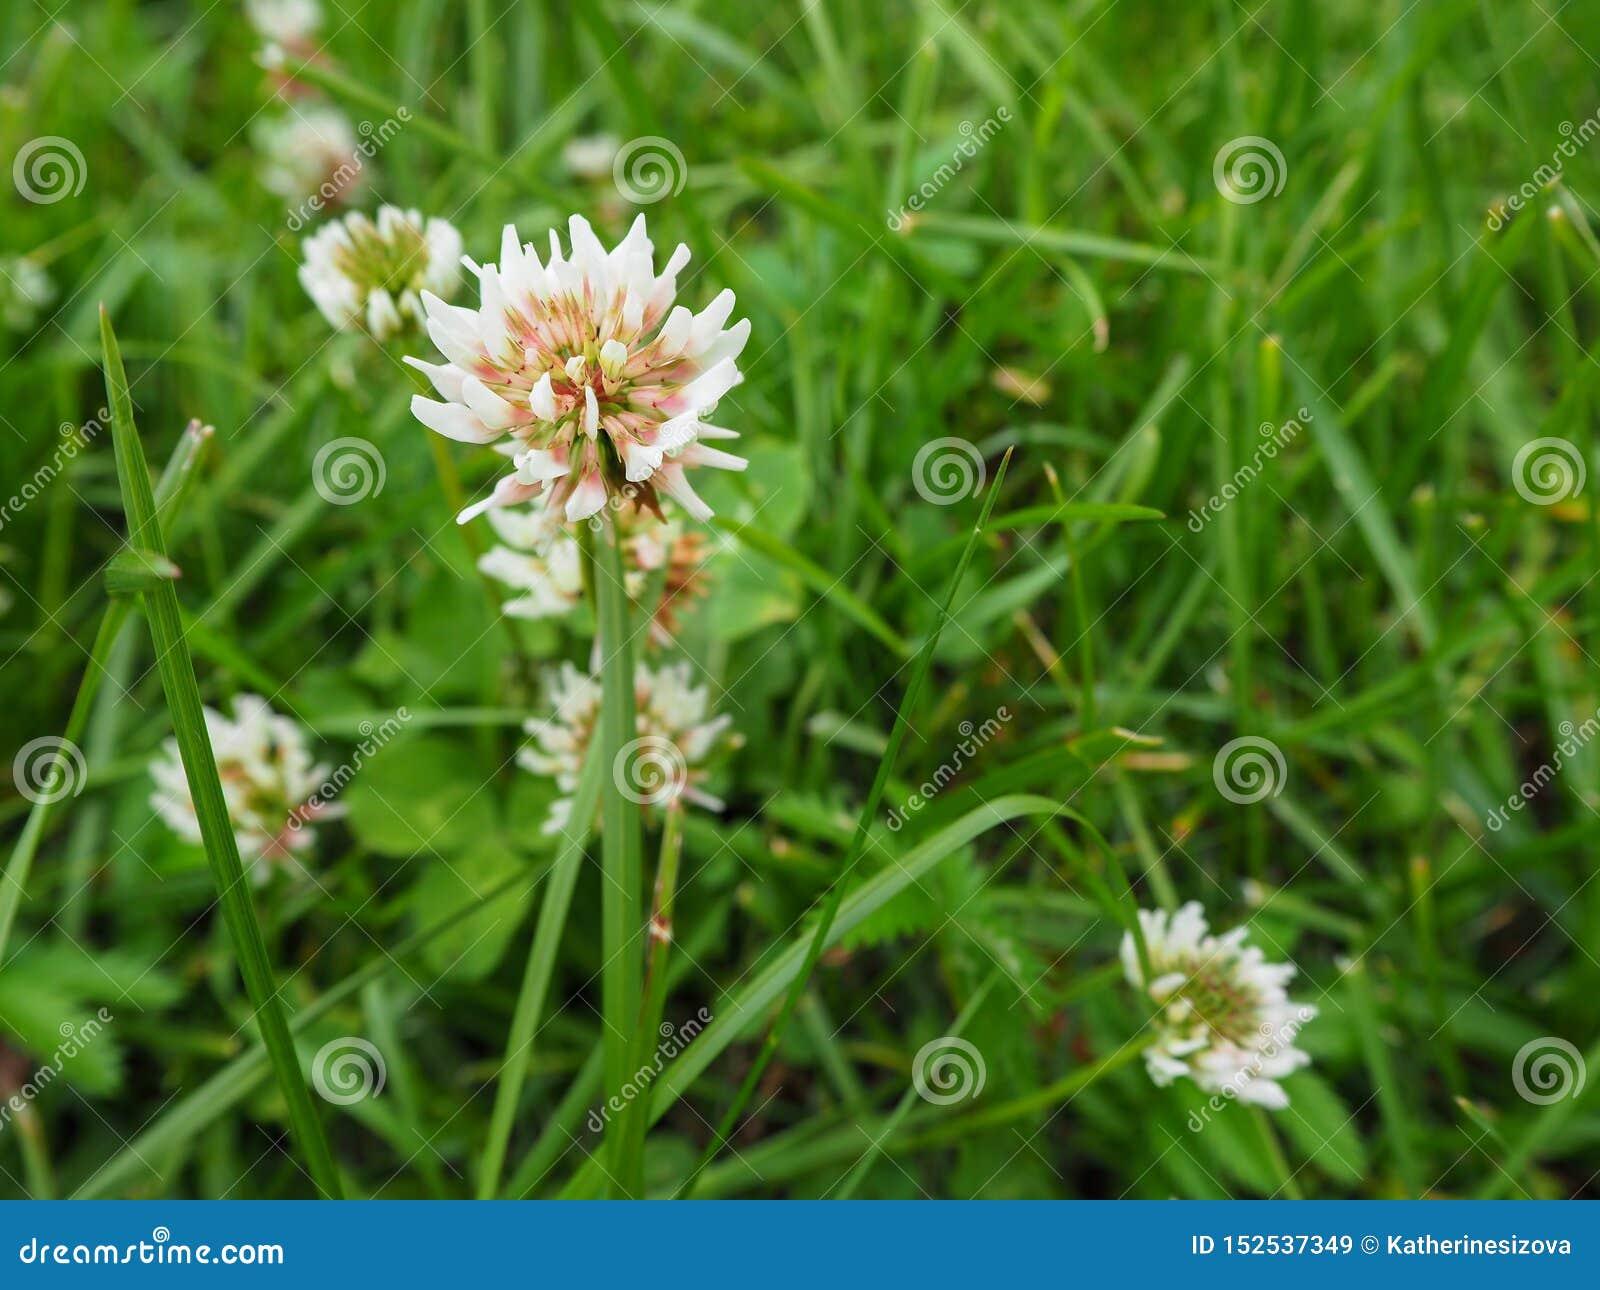 White clover or trefoil flower Trifolium close up on the green clover field